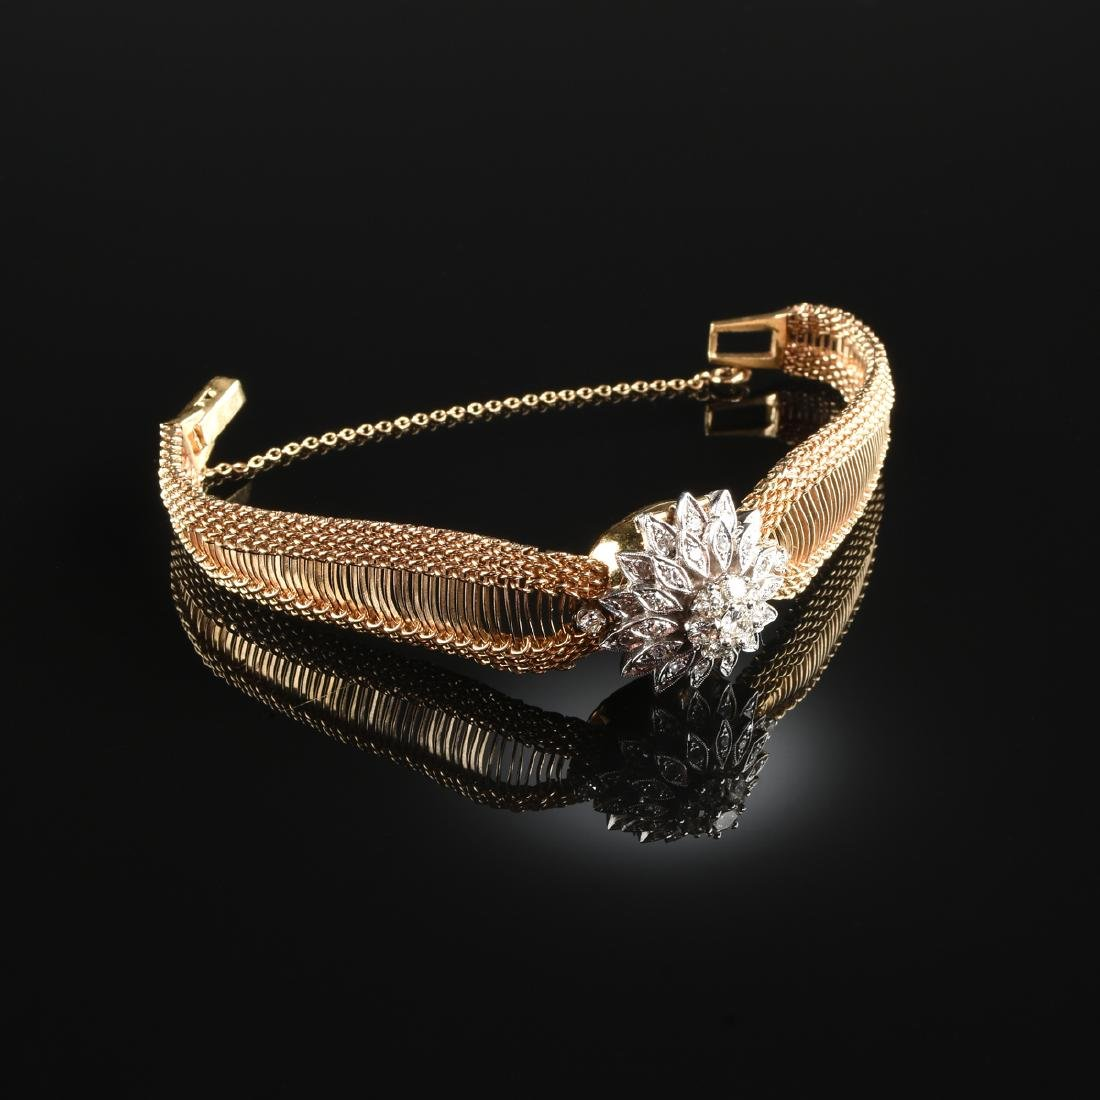 A 14K TWO TONE GOLD AND DIAMOND HAMILTON LADY'S